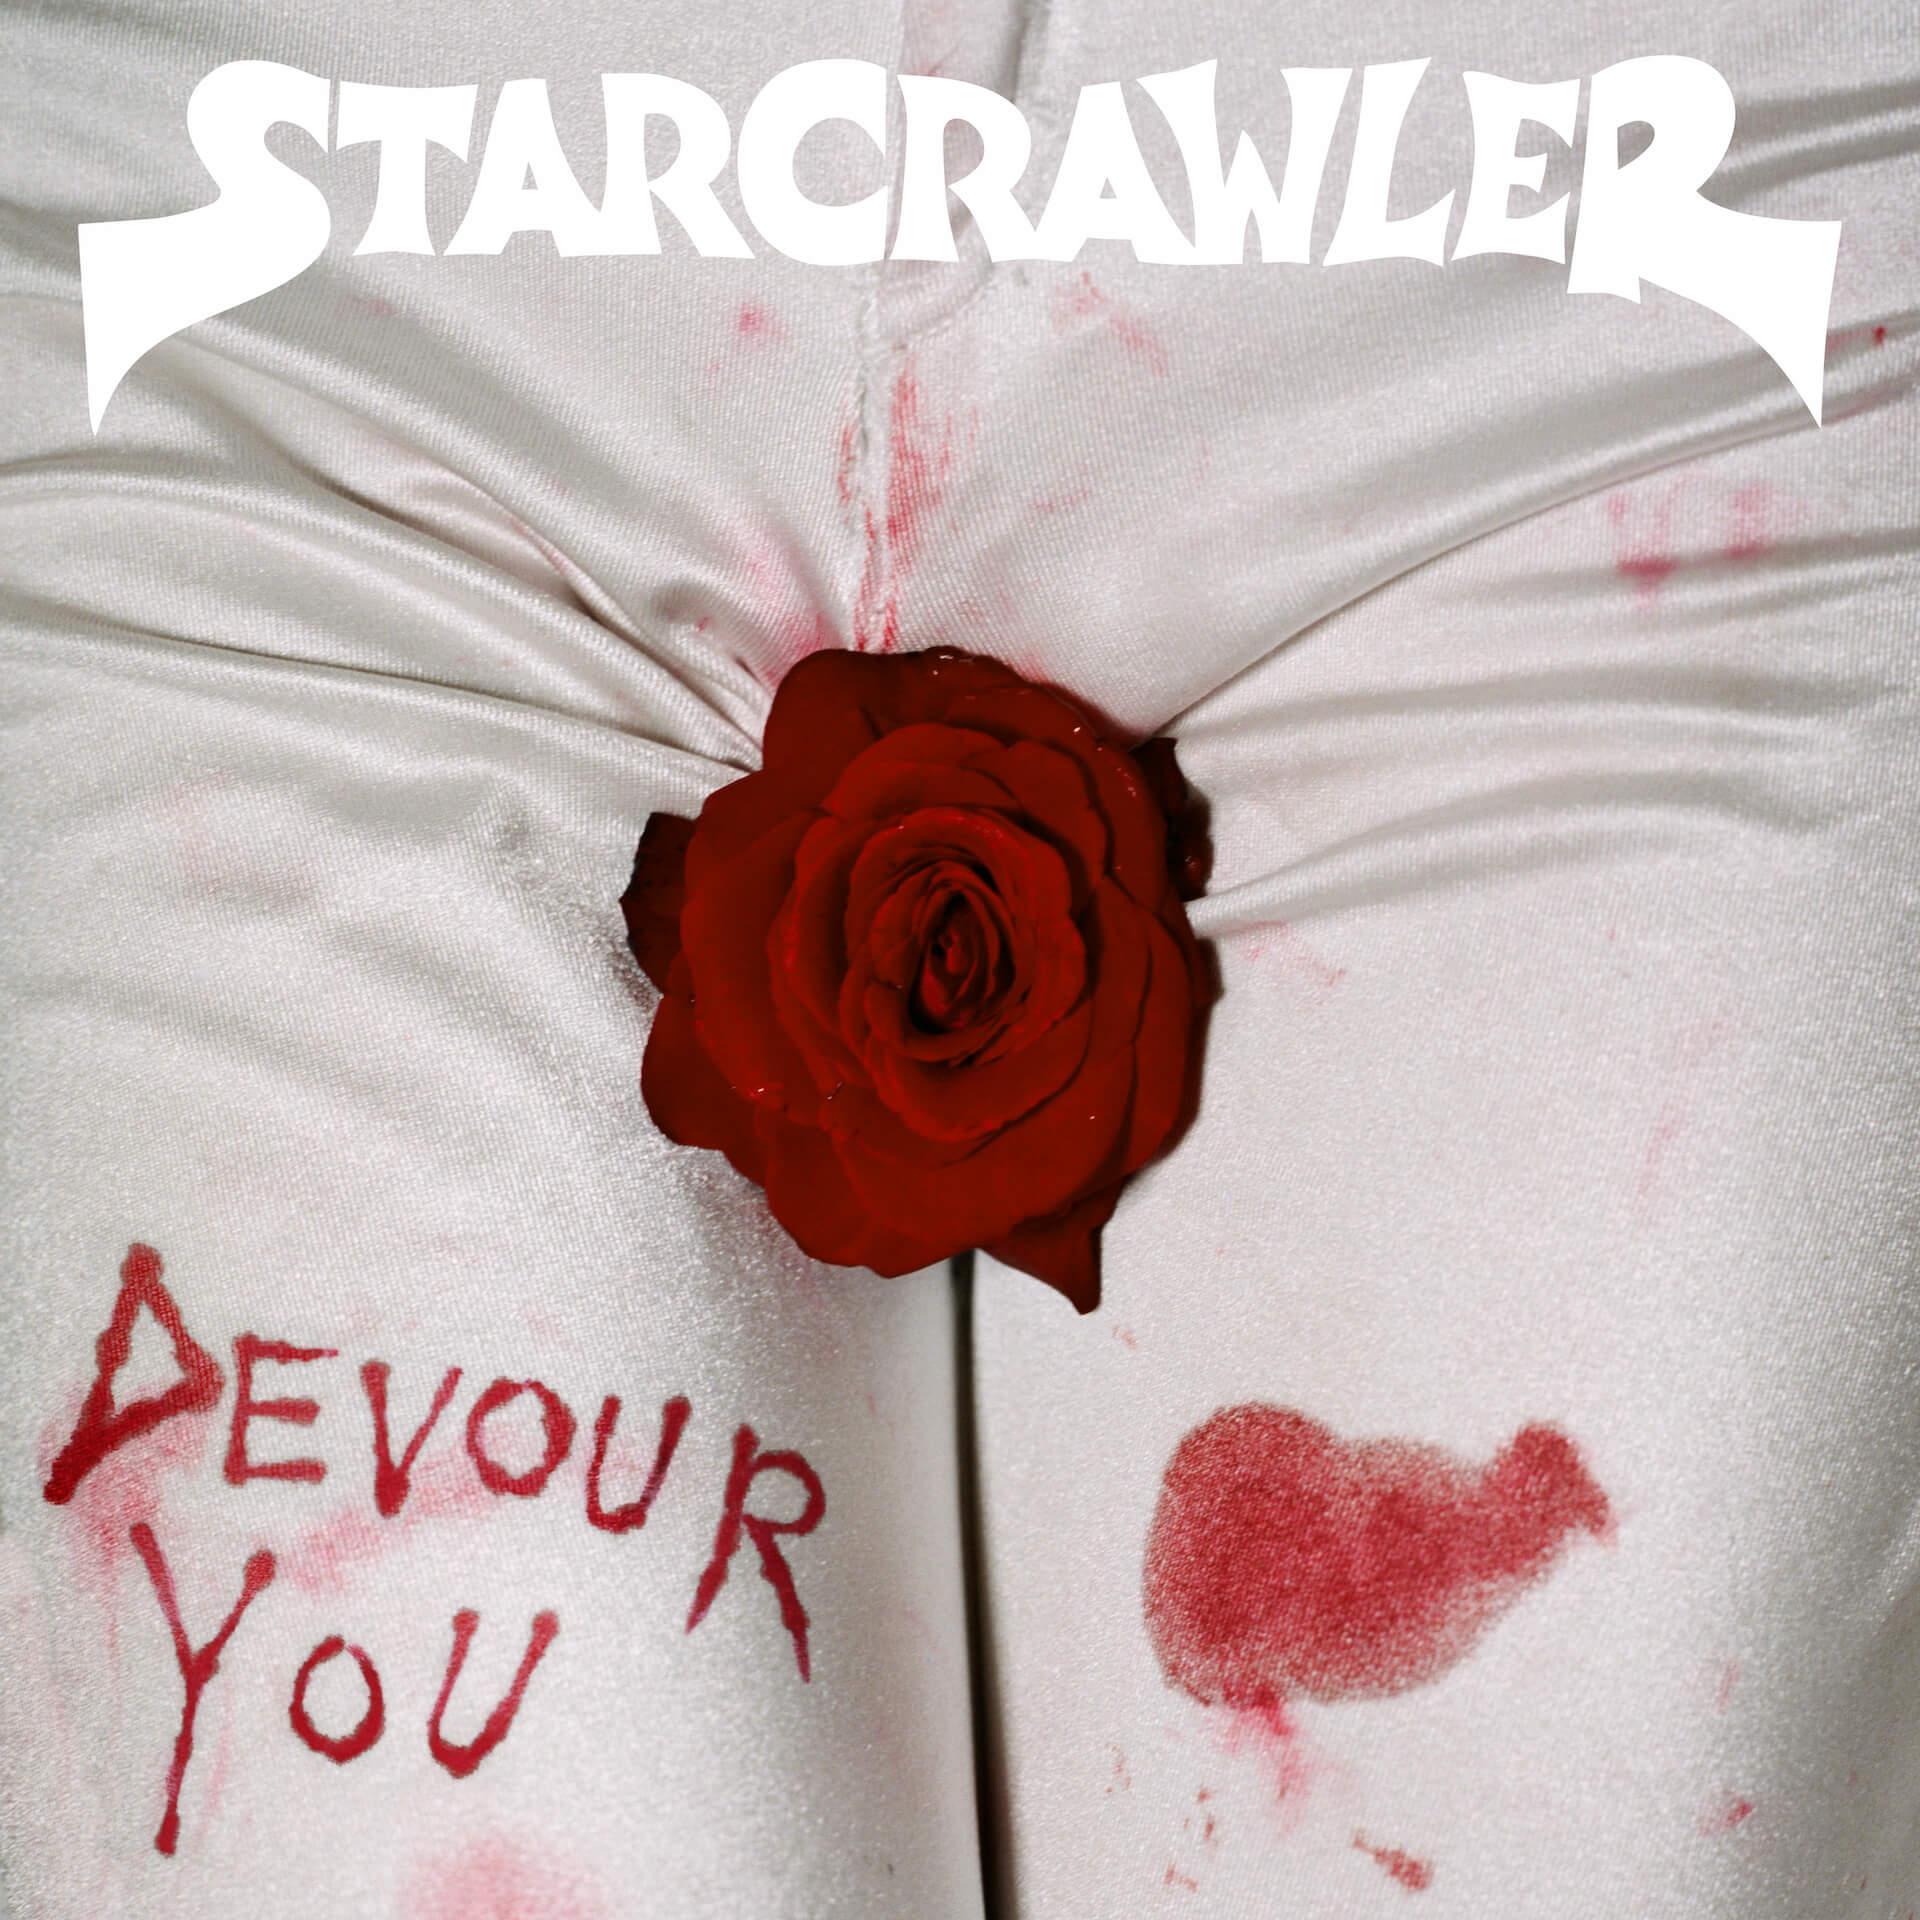 Starcrawler アロウ・デ・ワイルドが最新作で見出したボーカルとしての真髄 Starcrawler_DevourYou